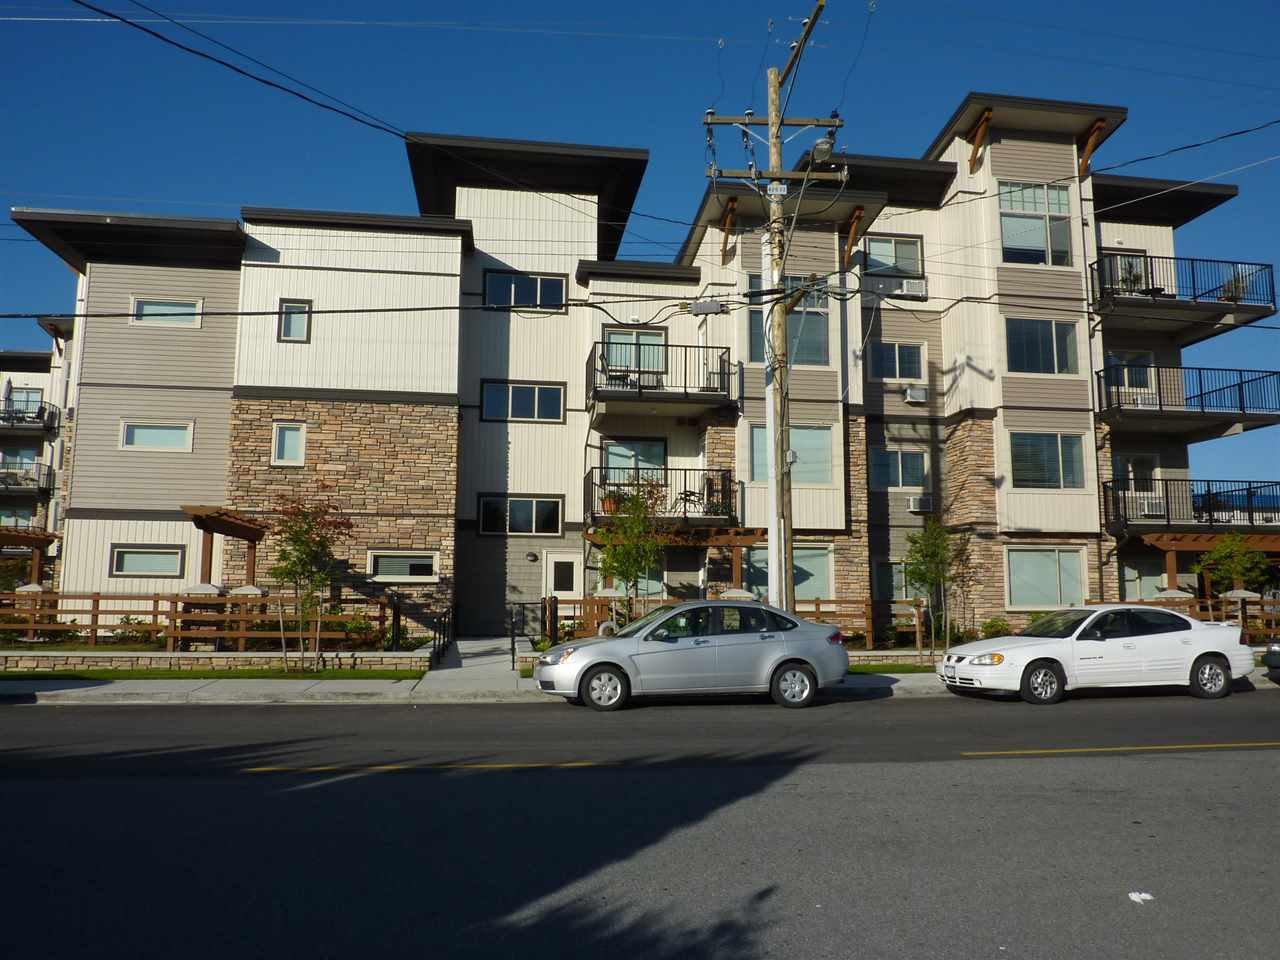 "Main Photo: 108 11935 BURNETT Street in Maple Ridge: East Central Condo for sale in ""KENSINGTON"" : MLS®# R2162043"